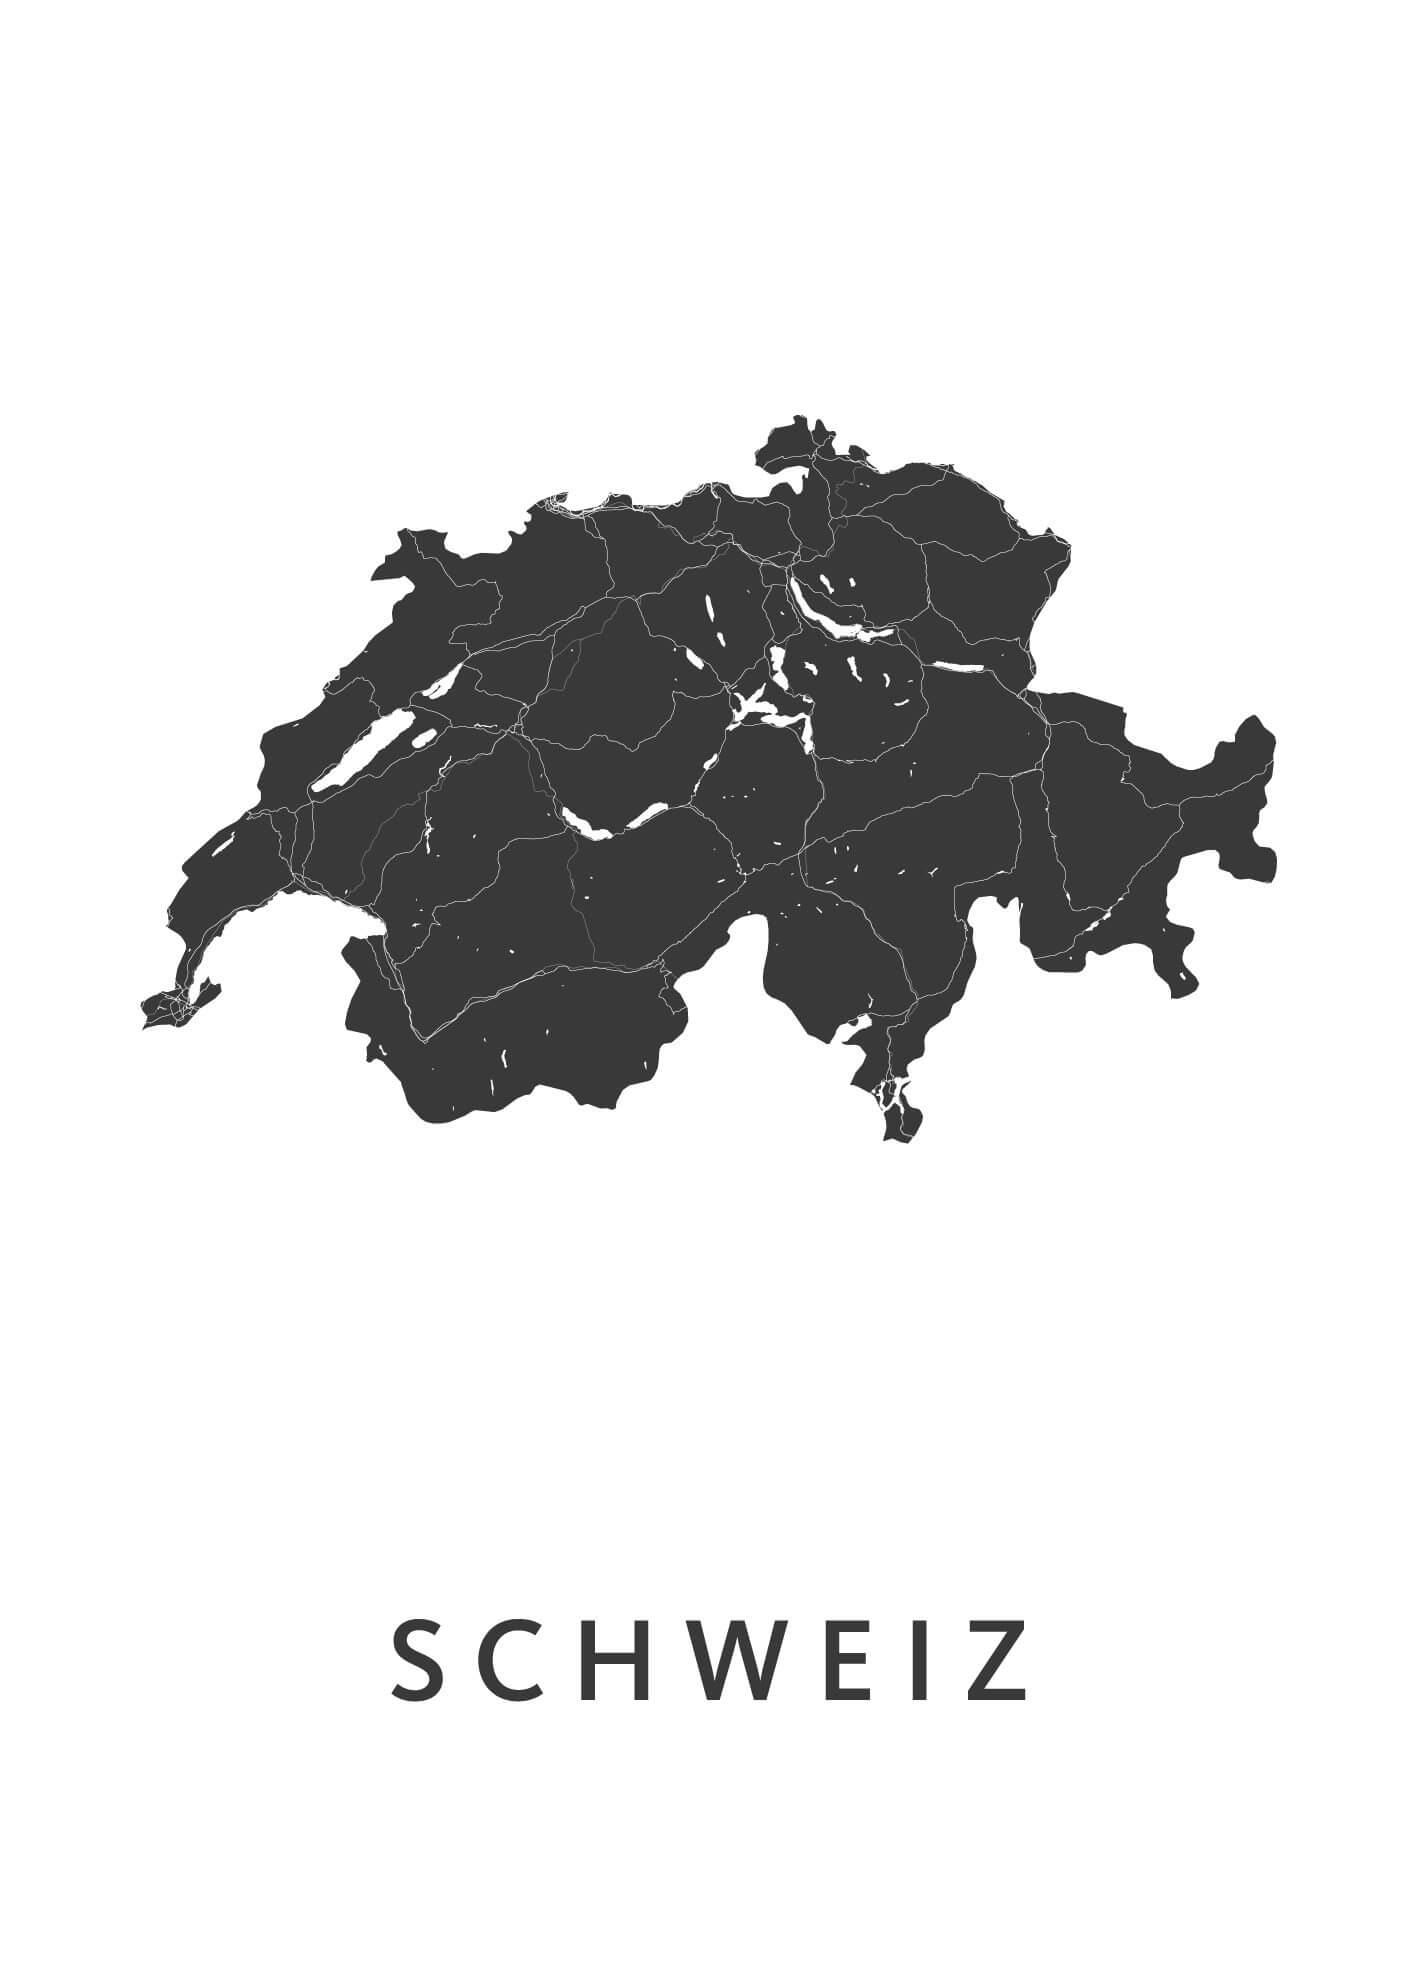 Schweiz Country Map stadskaart poster